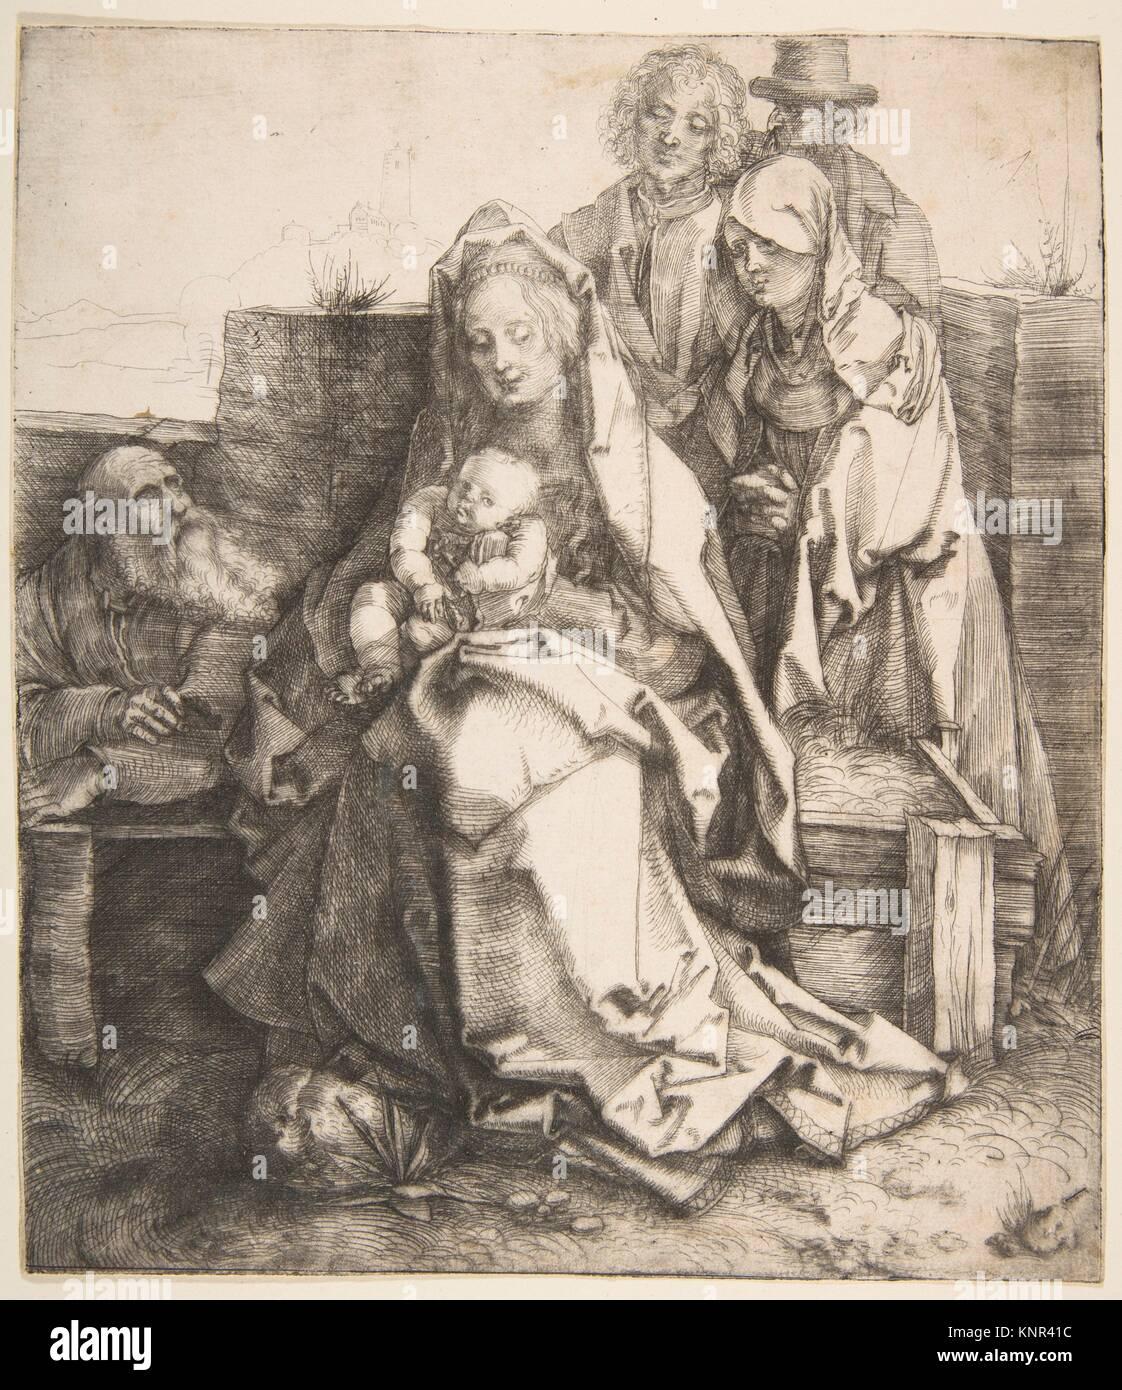 The Holy Family. Artist: Albrecht Dürer (German, Nuremberg 1471-1528 Nuremberg); Date: 1512-13; Medium: Drypoint; - Stock Image